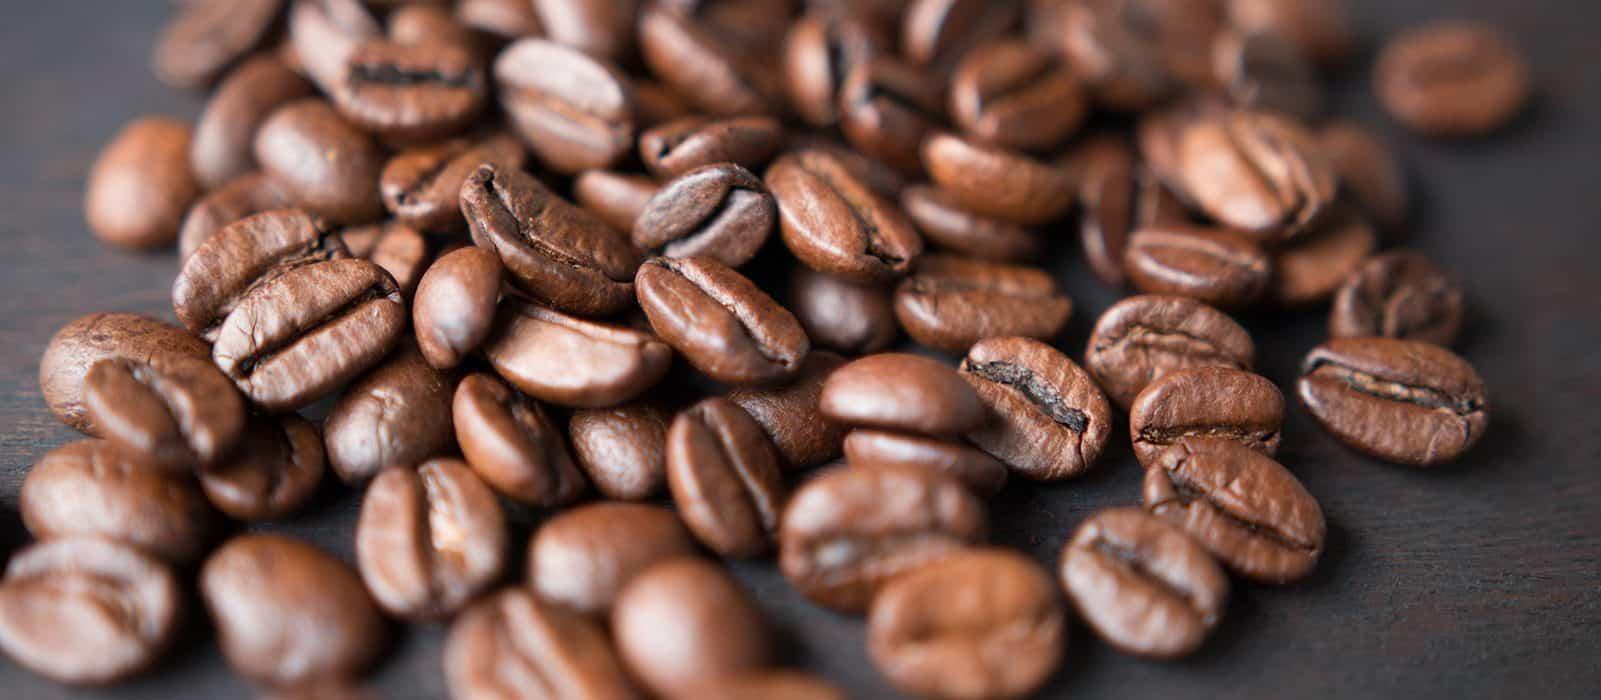 granos de cafe la cafetera perfecta e1591870647180